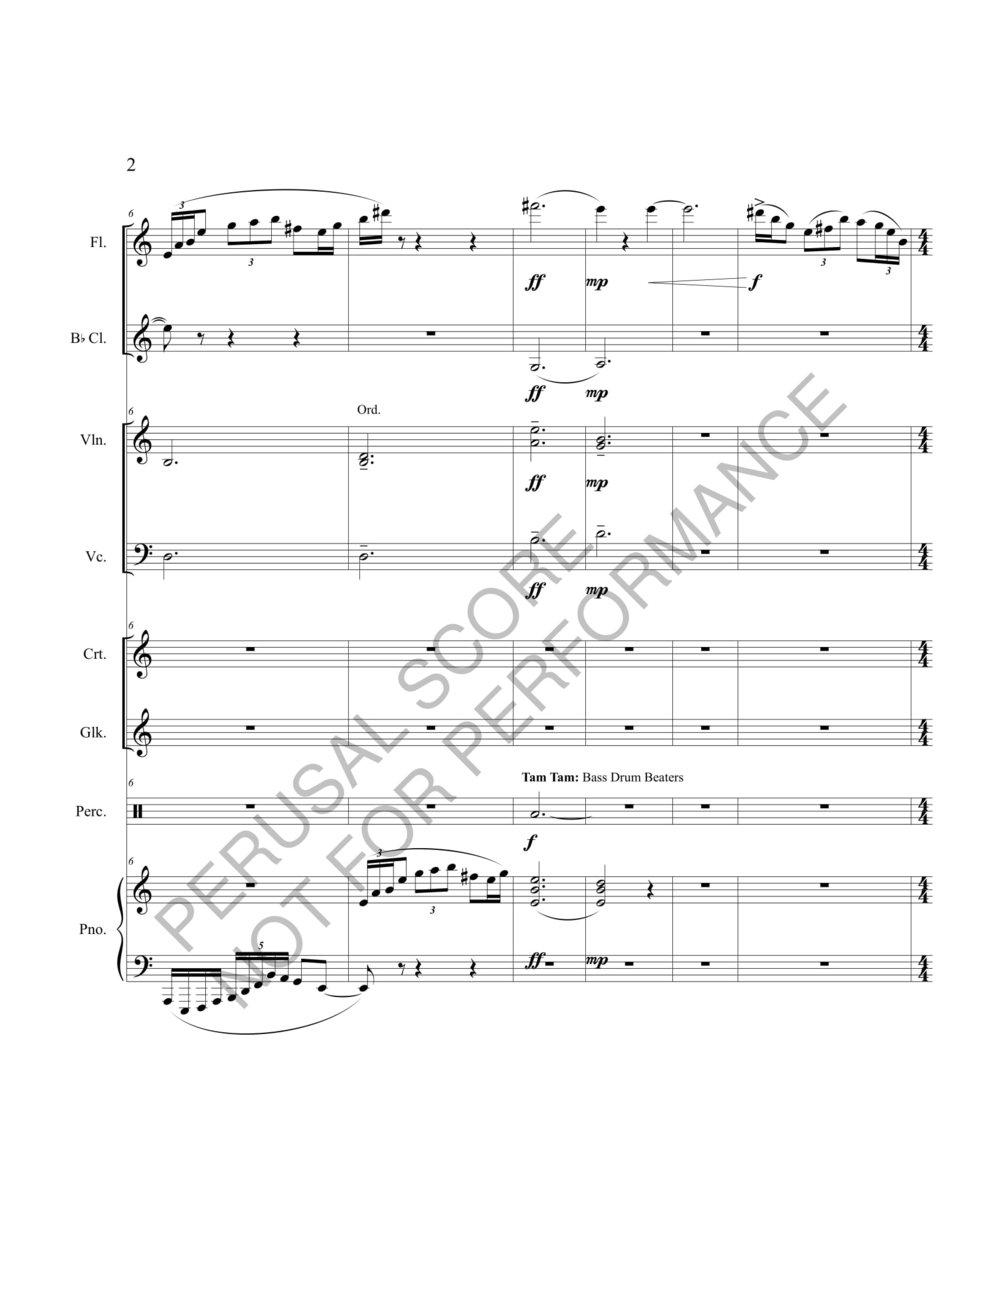 Boyd Terra Liberi Score-watermark-08.jpg